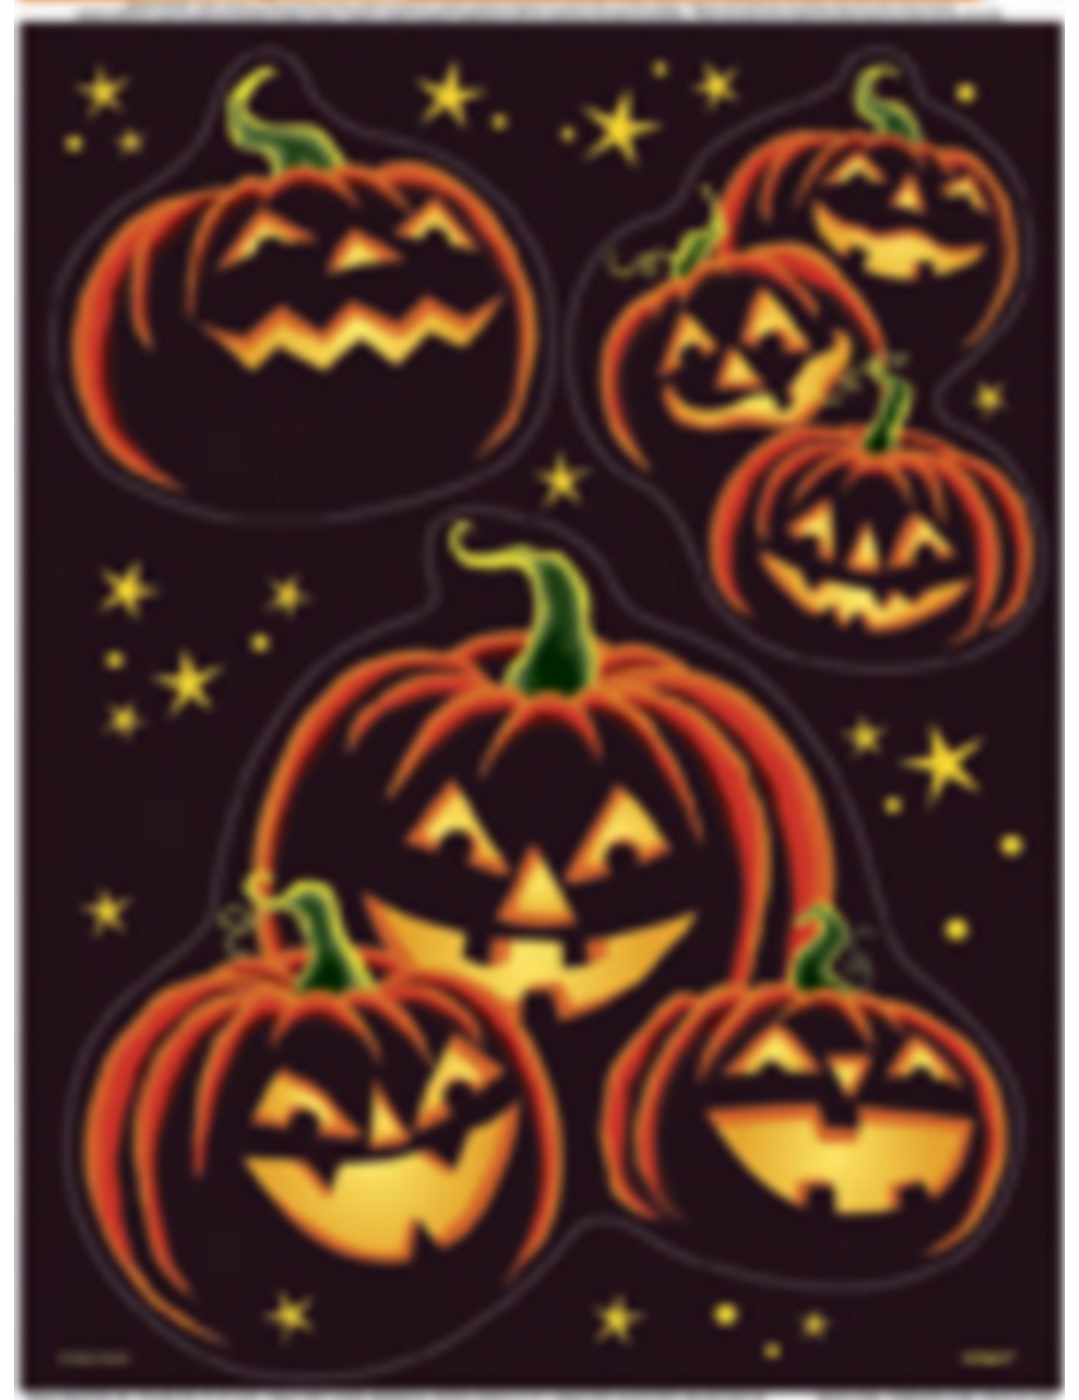 Halloween k rbis aufkleber fensterdeko schwarz orange g nstige faschings partydeko zubeh r - Halloween fensterdeko ...